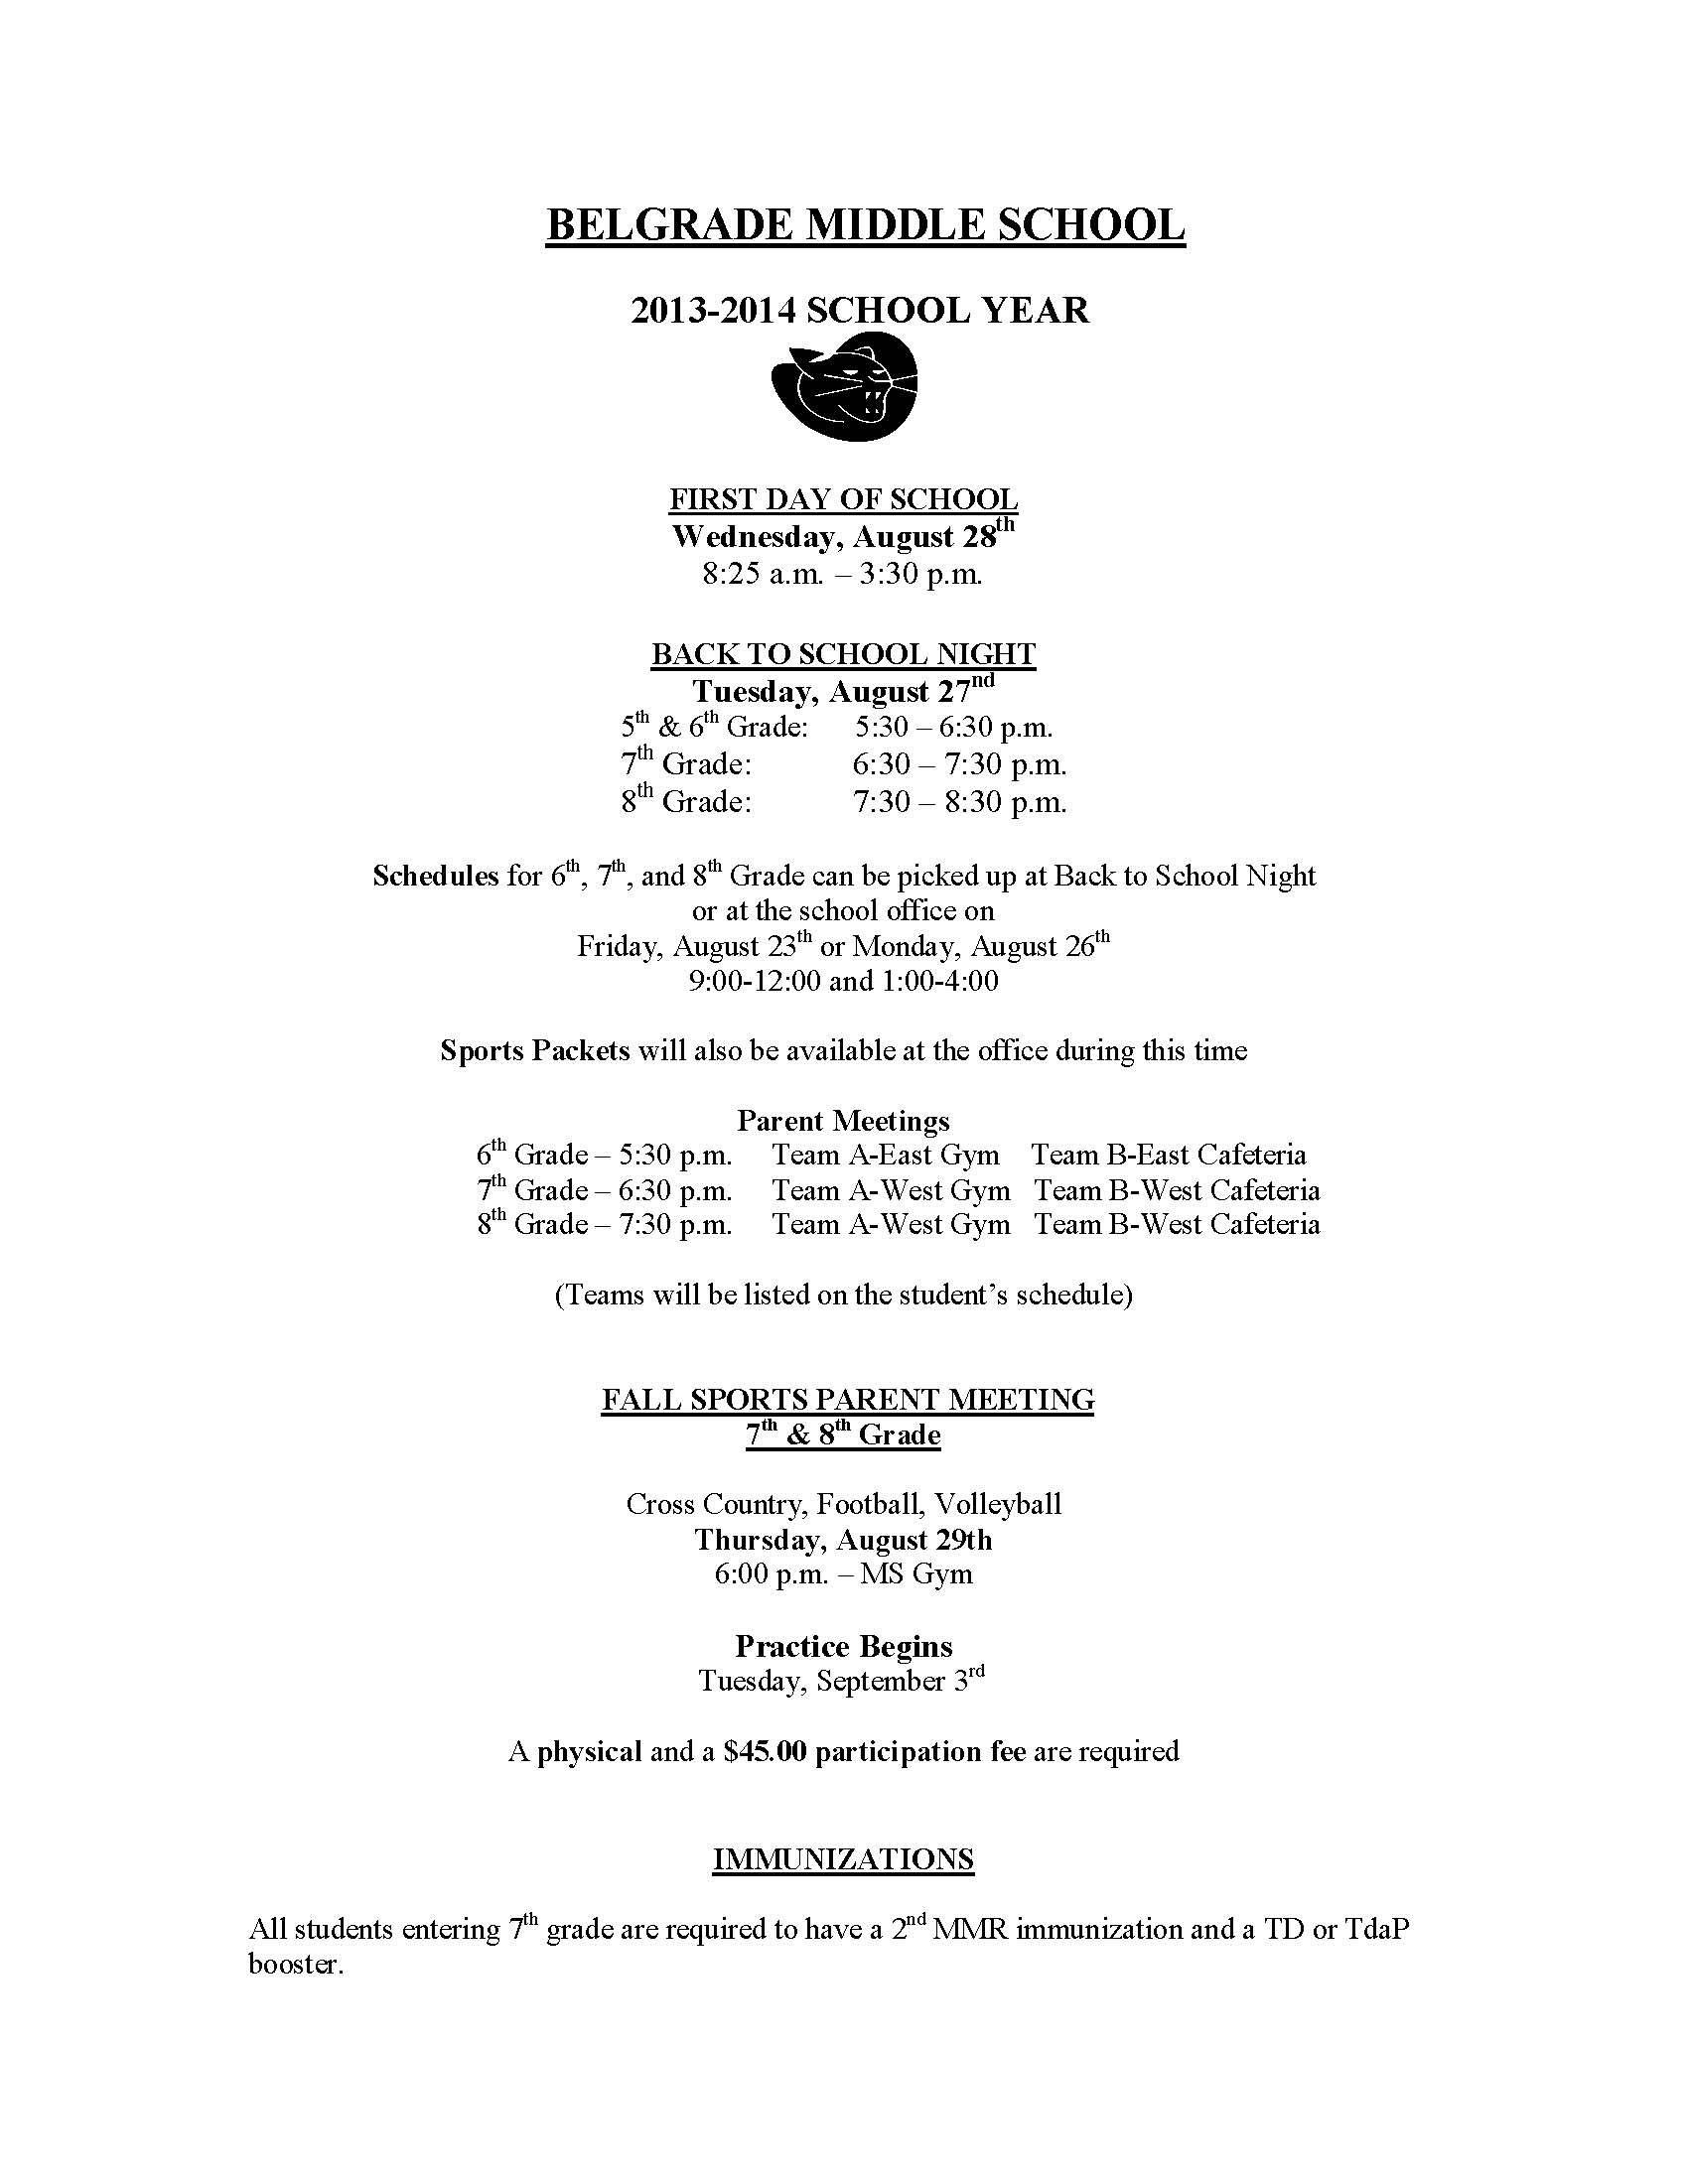 Middle School Back to School Newsletter   School newsletter [ 2200 x 1700 Pixel ]